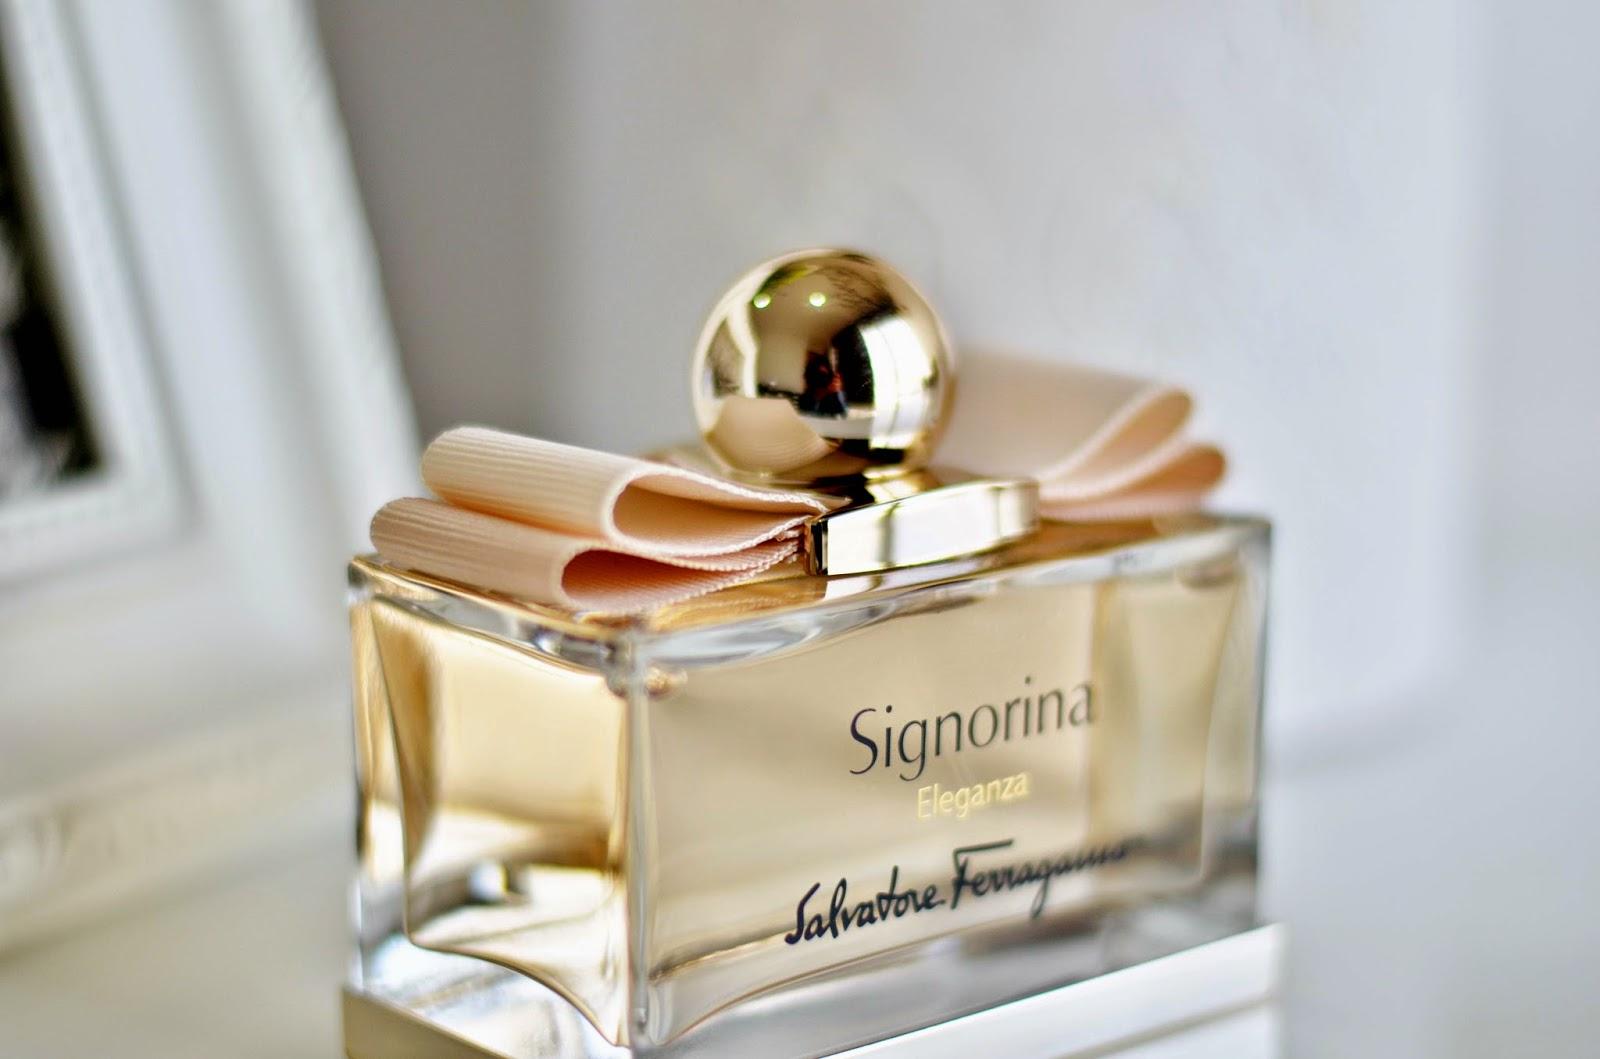 ba2747e8693 Signorina Eleganza - High on Fashion